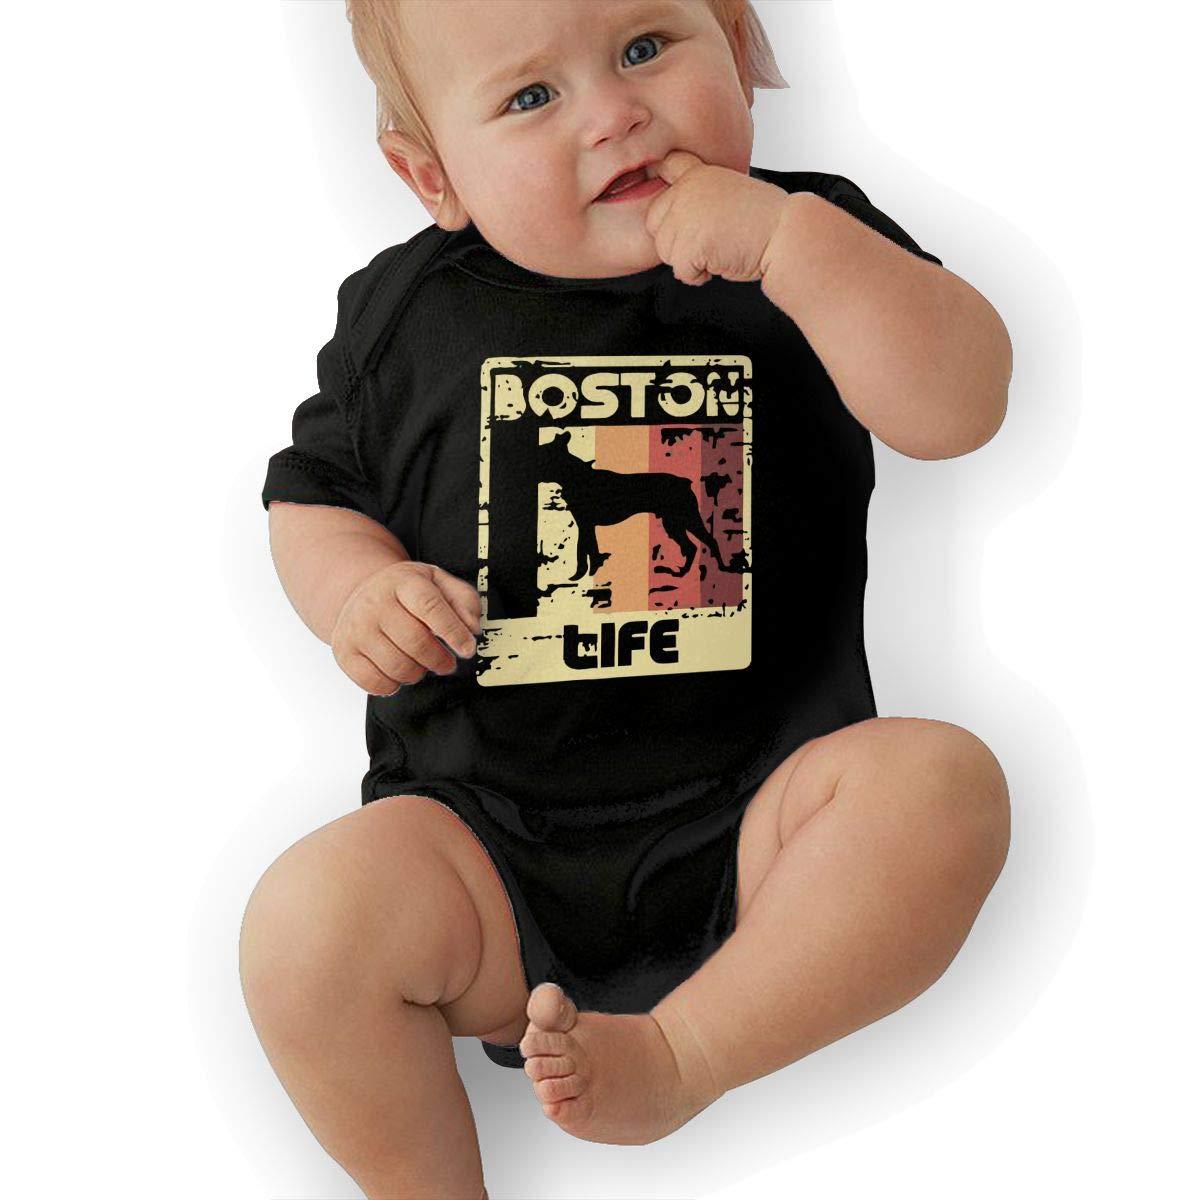 Boston Terrier Life Baby Boys Girls Jumpsuit Overall Romper Bodysuit Summer Clothes Black